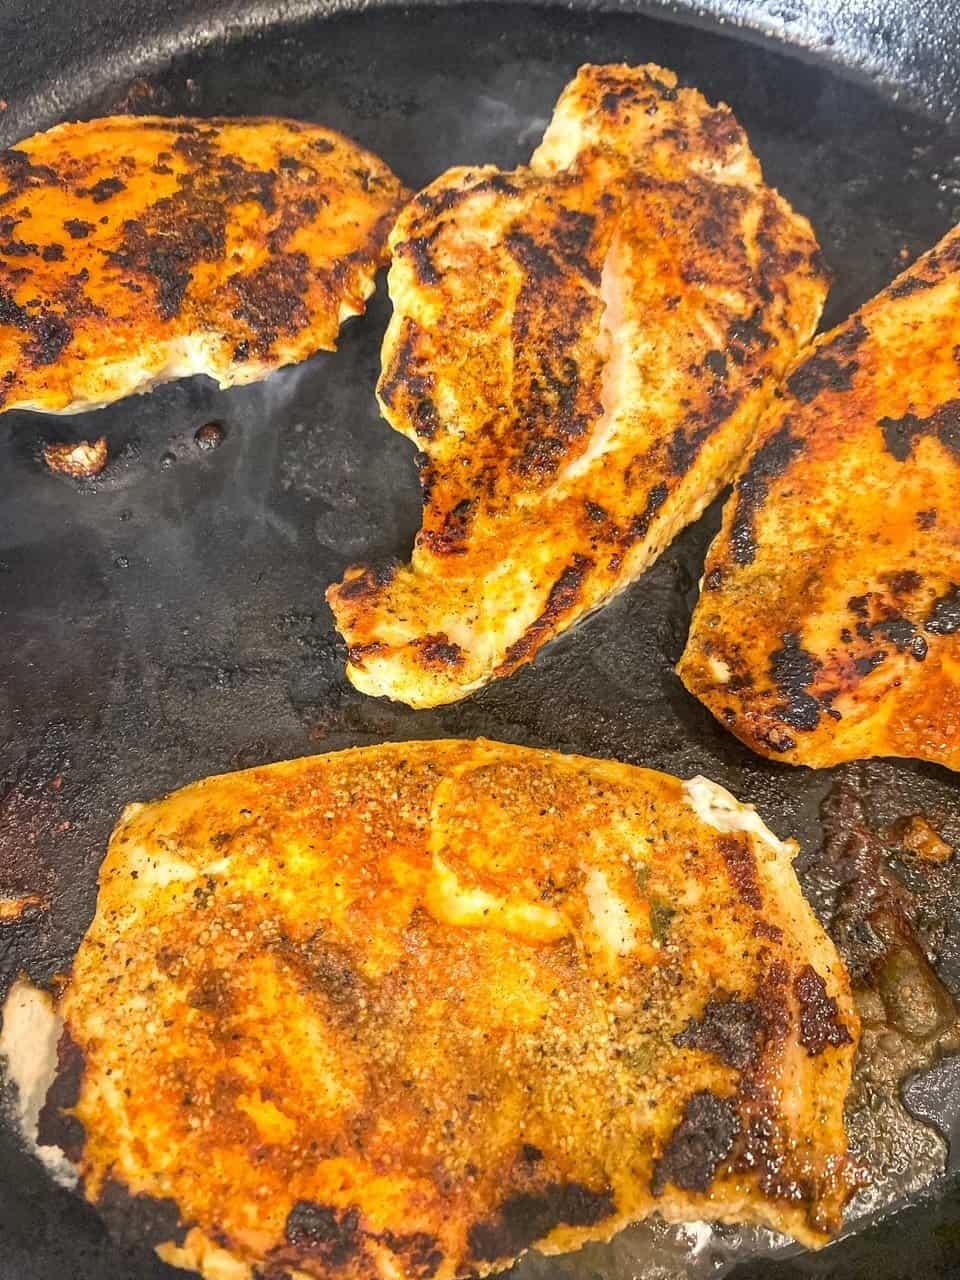 blackened chicken breast